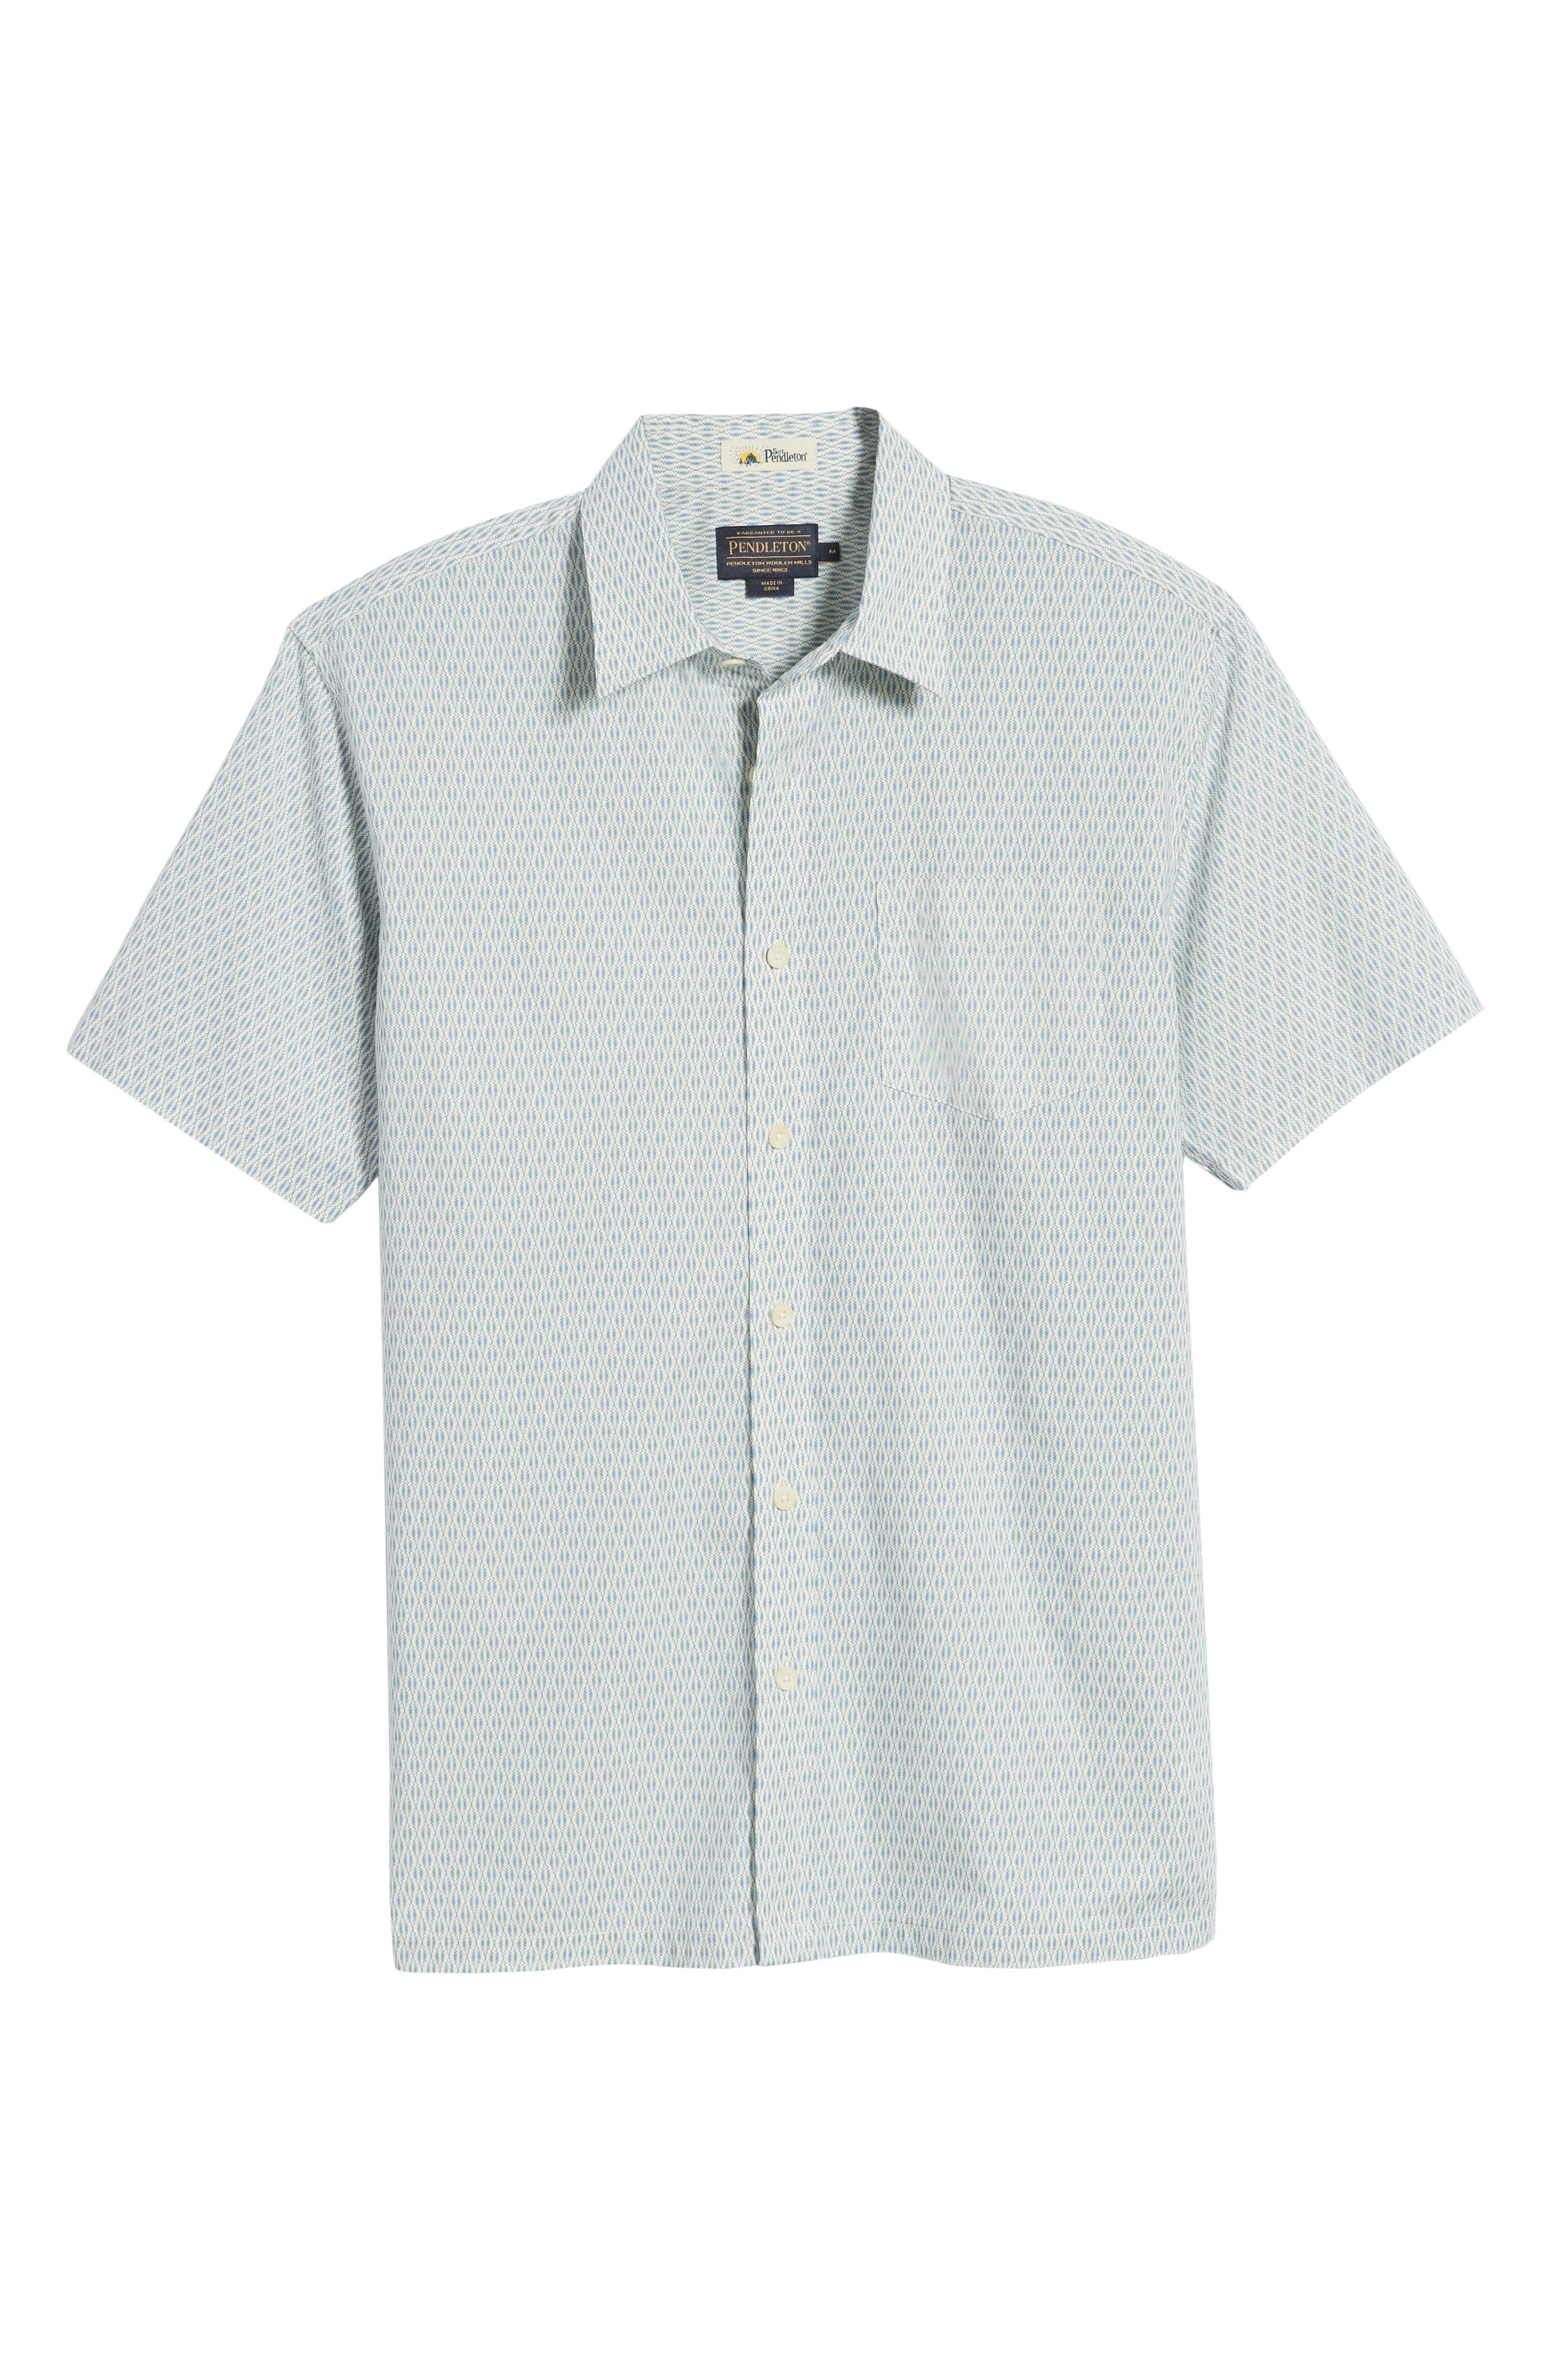 Regular Fit Print Short Sleeve Sport Shirt,                             Alternate thumbnail 6, color,                             VINTAGE NAVY SQUIGGLE